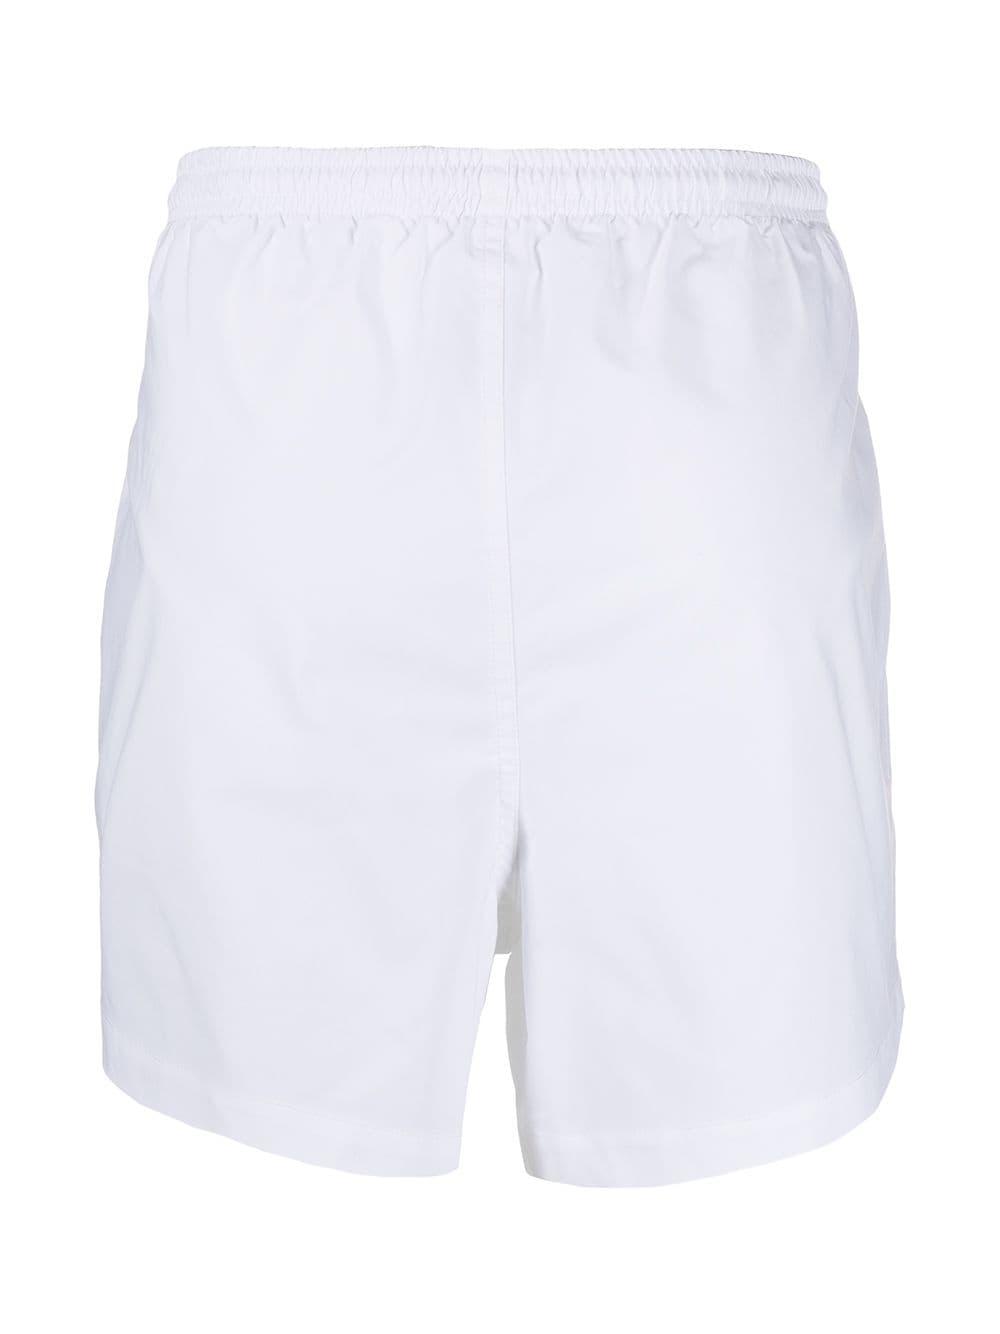 COTTON SHORT CASABLANCA | Shorts | MS21-TR-032WHITE